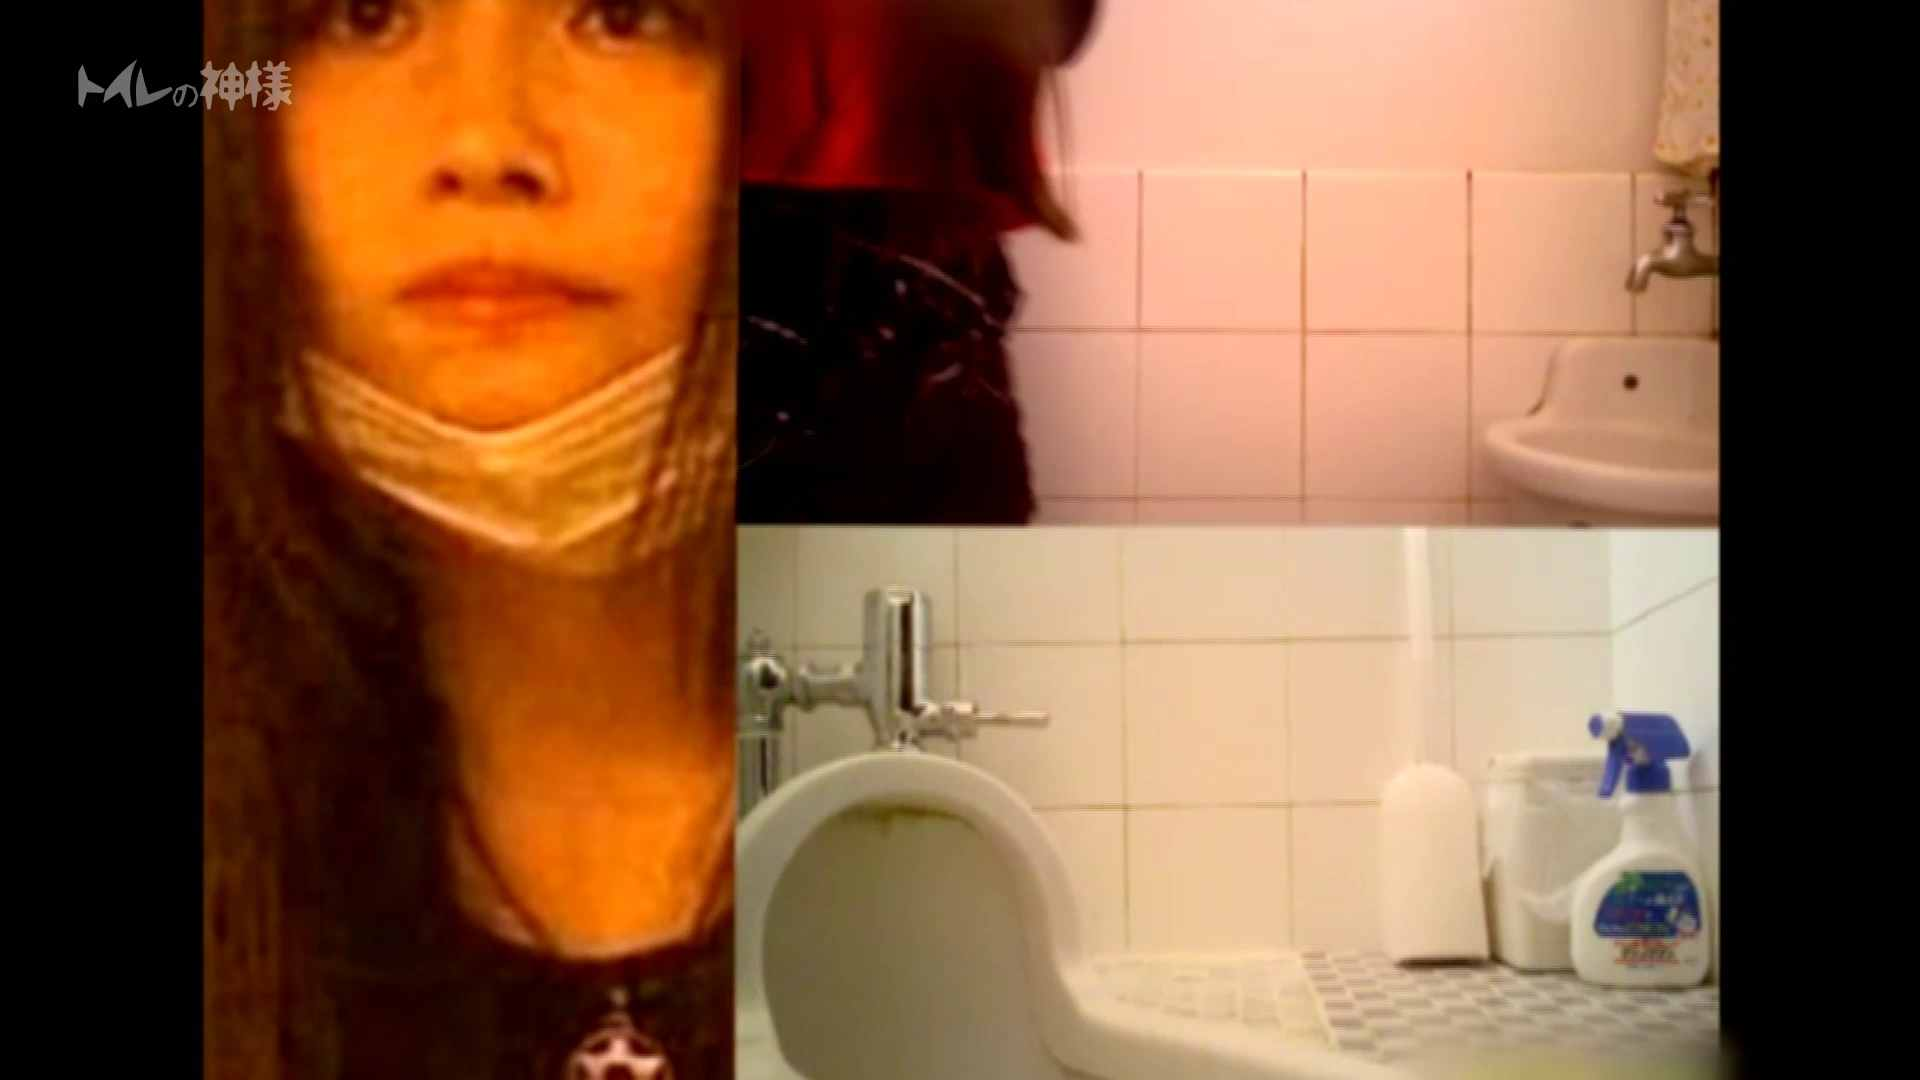 Vol.02 花の女子大生うんこ盗撮2 色っぽい女子大生 AV無料動画キャプチャ 82pic 8